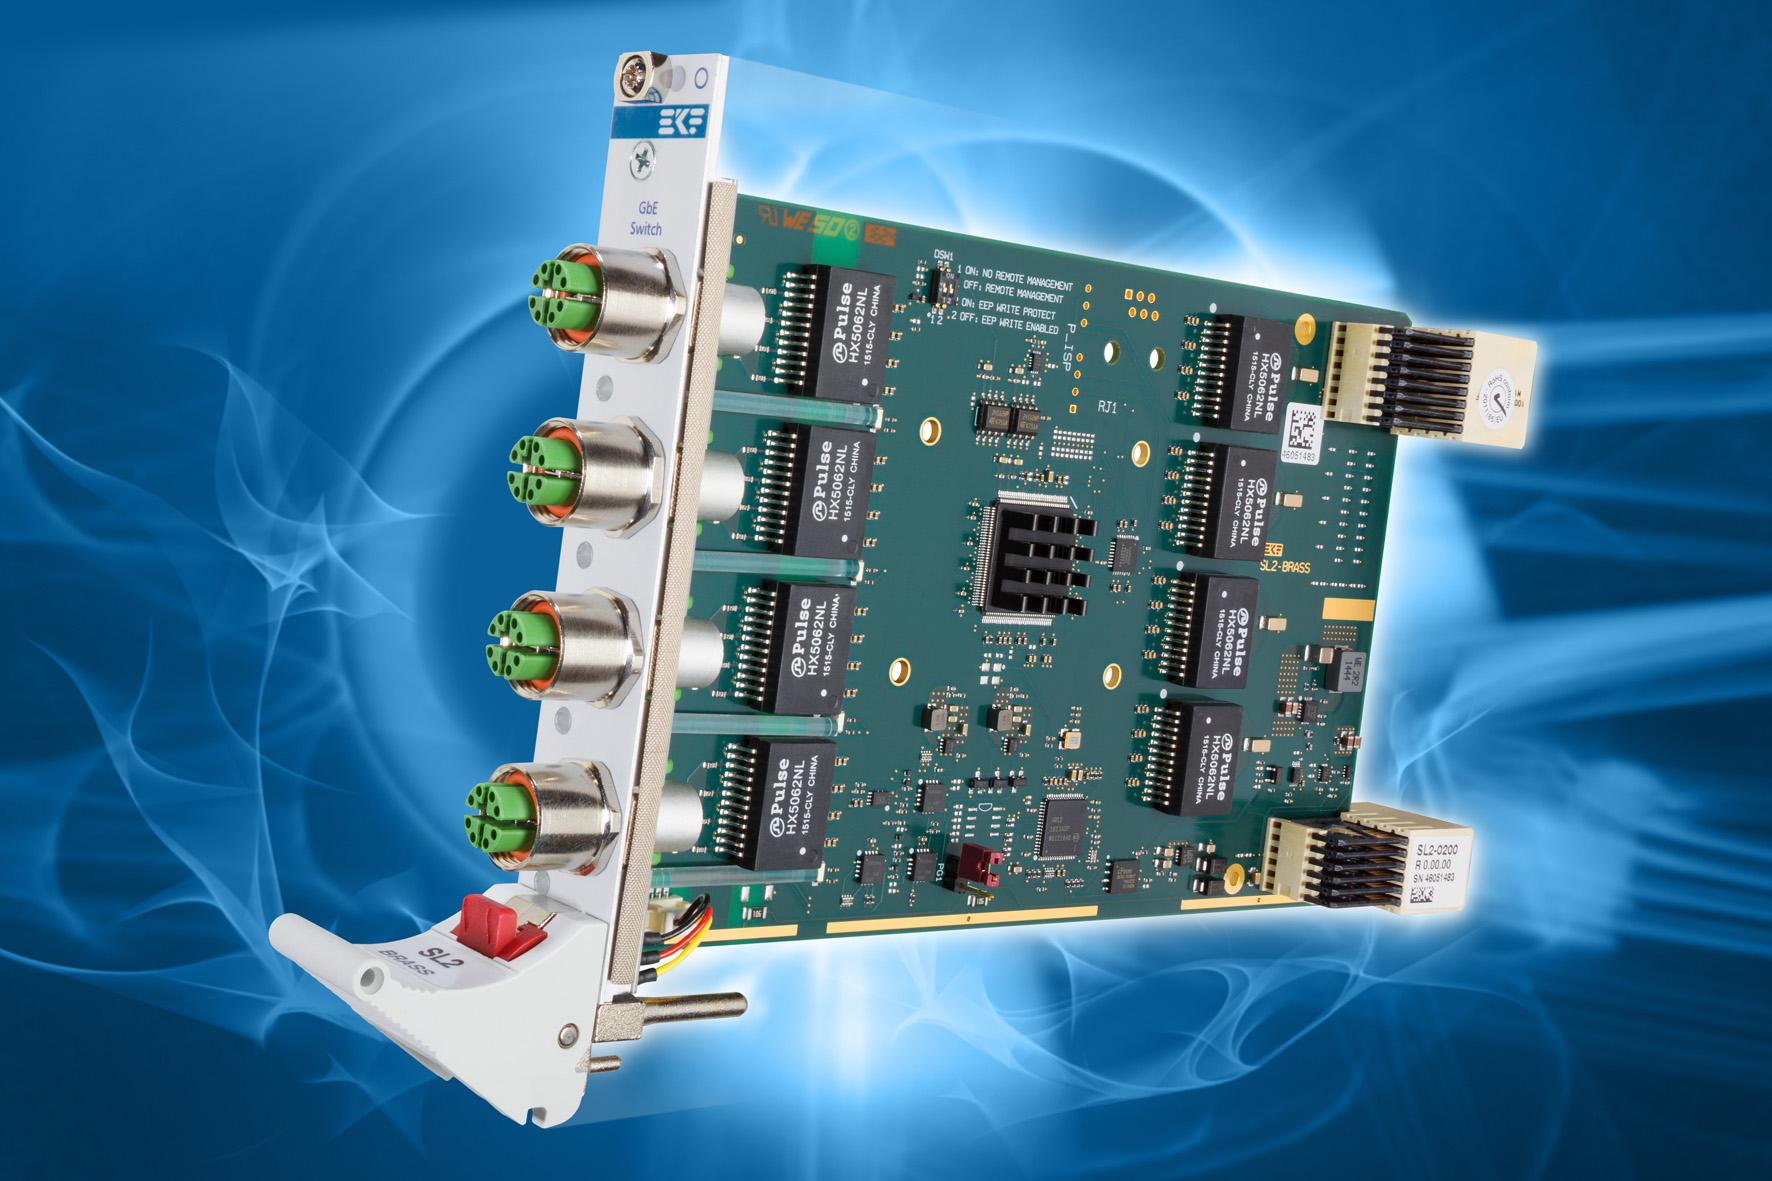 9-Port Gigabit Ethernet Switch